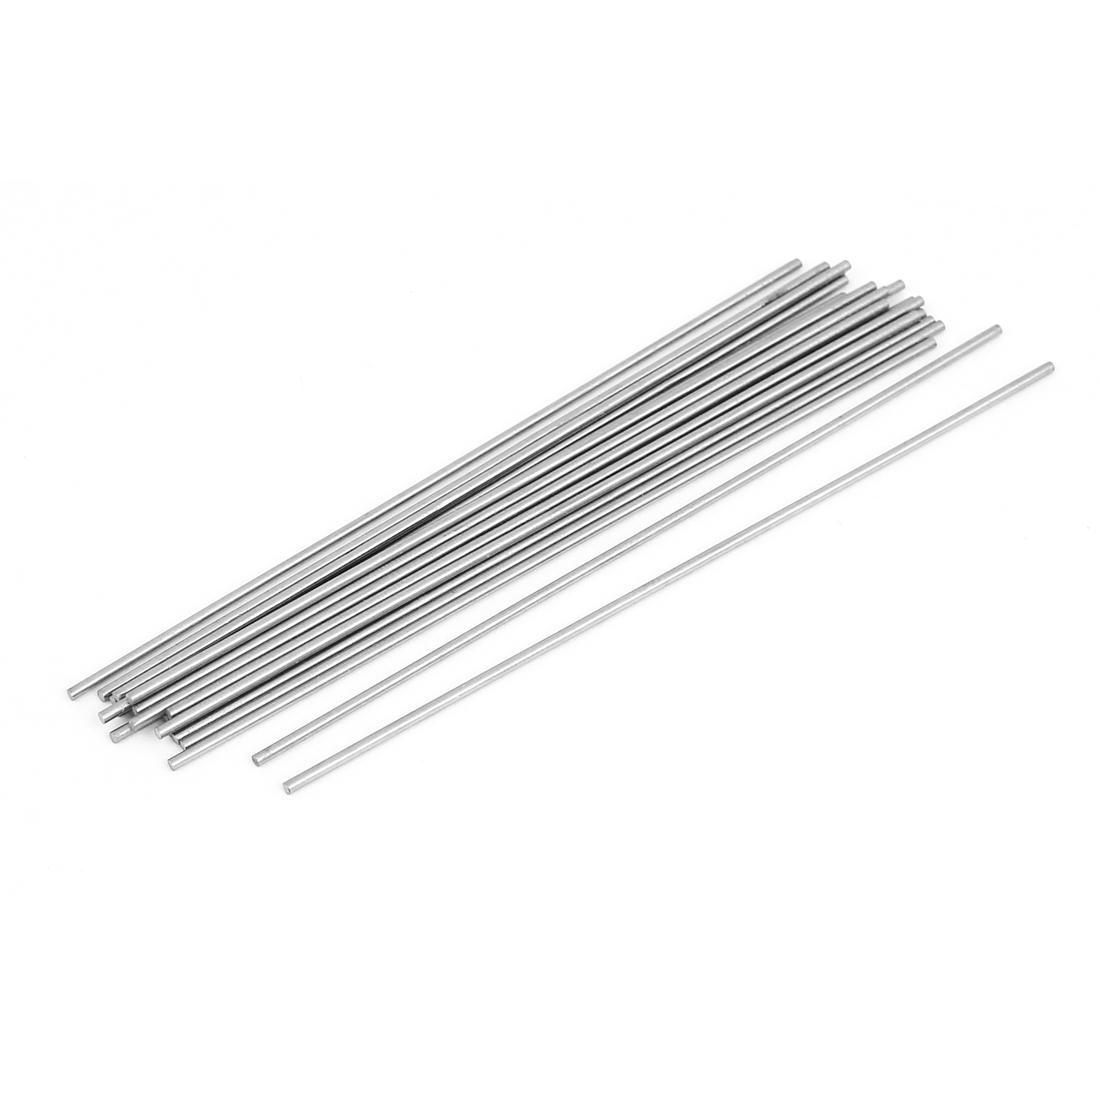 1.3mm Diameter 100mm Long Machine Boring Tool Steel Round Lathe Bars 20 Pcs